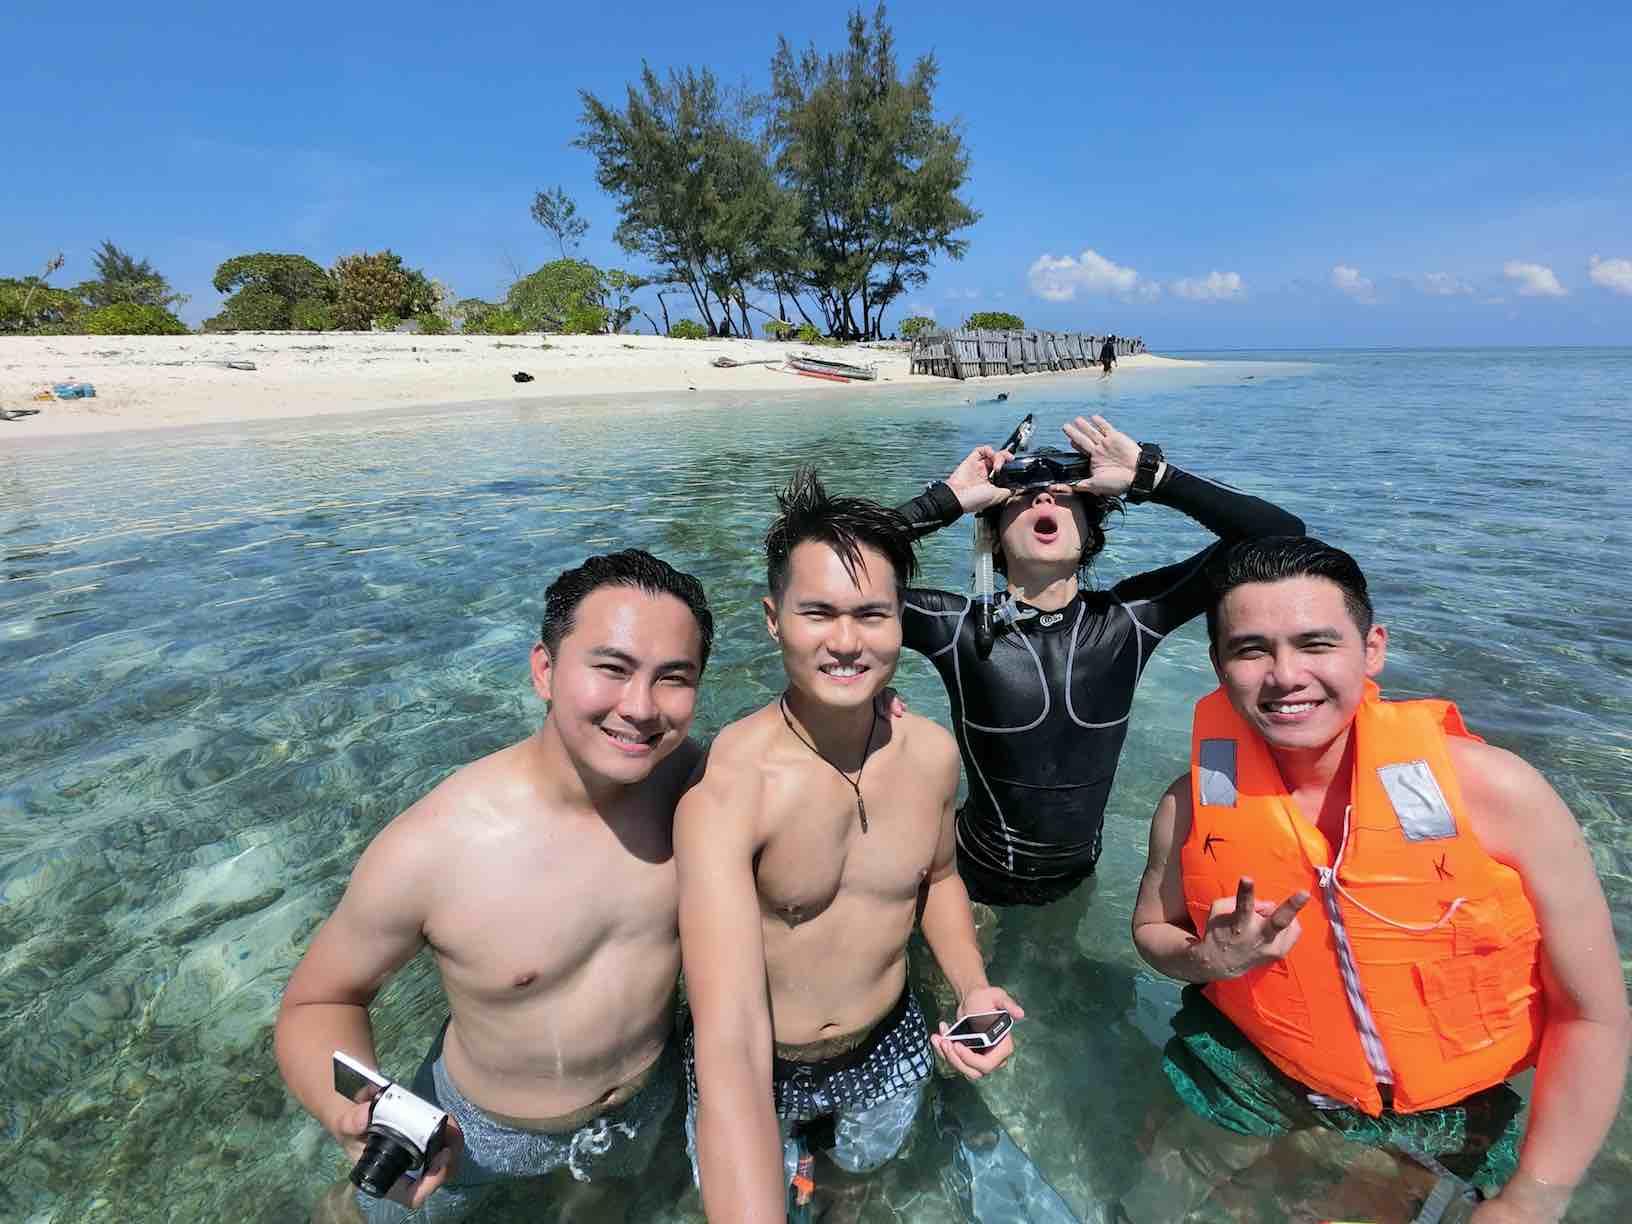 Snorkelling at Kodingareng Keke Island - AspirantSG